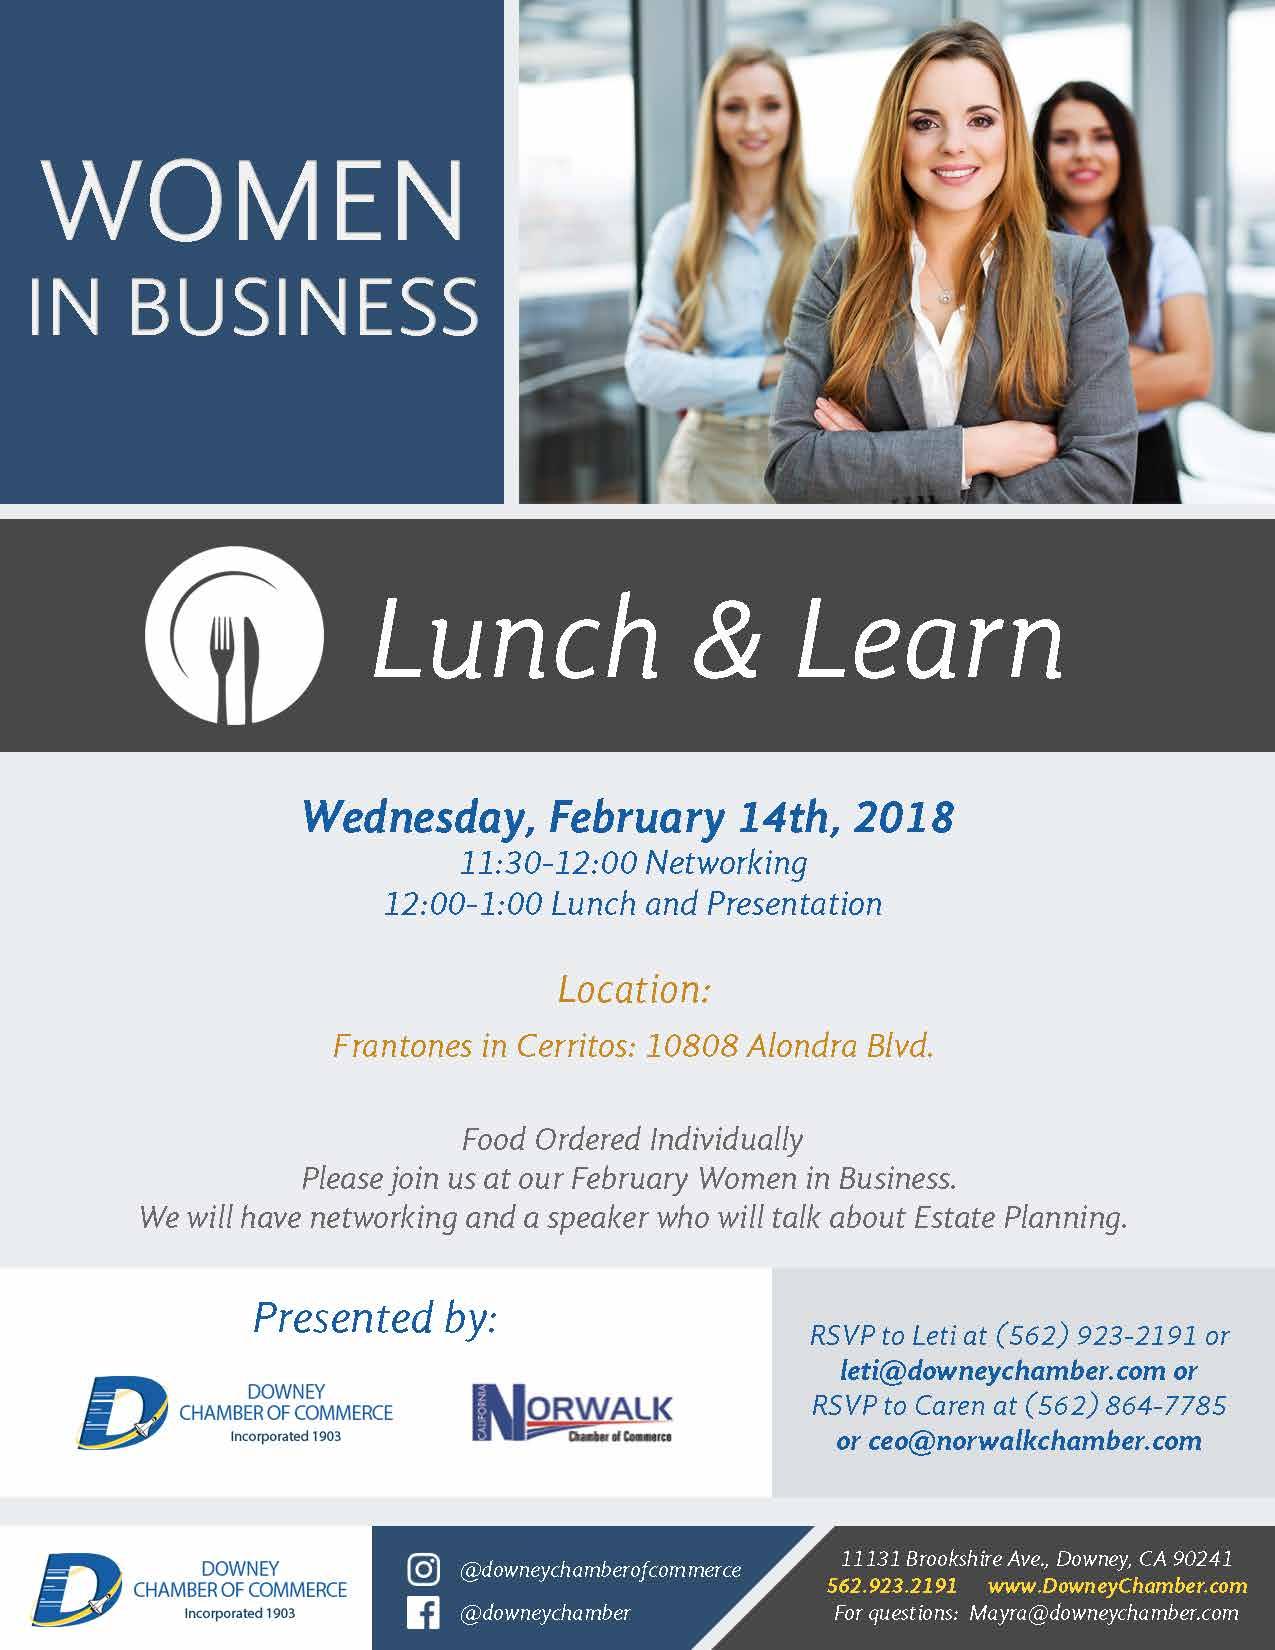 Dallas Business Lunch & Learn (Dallas, TX) | Meetup